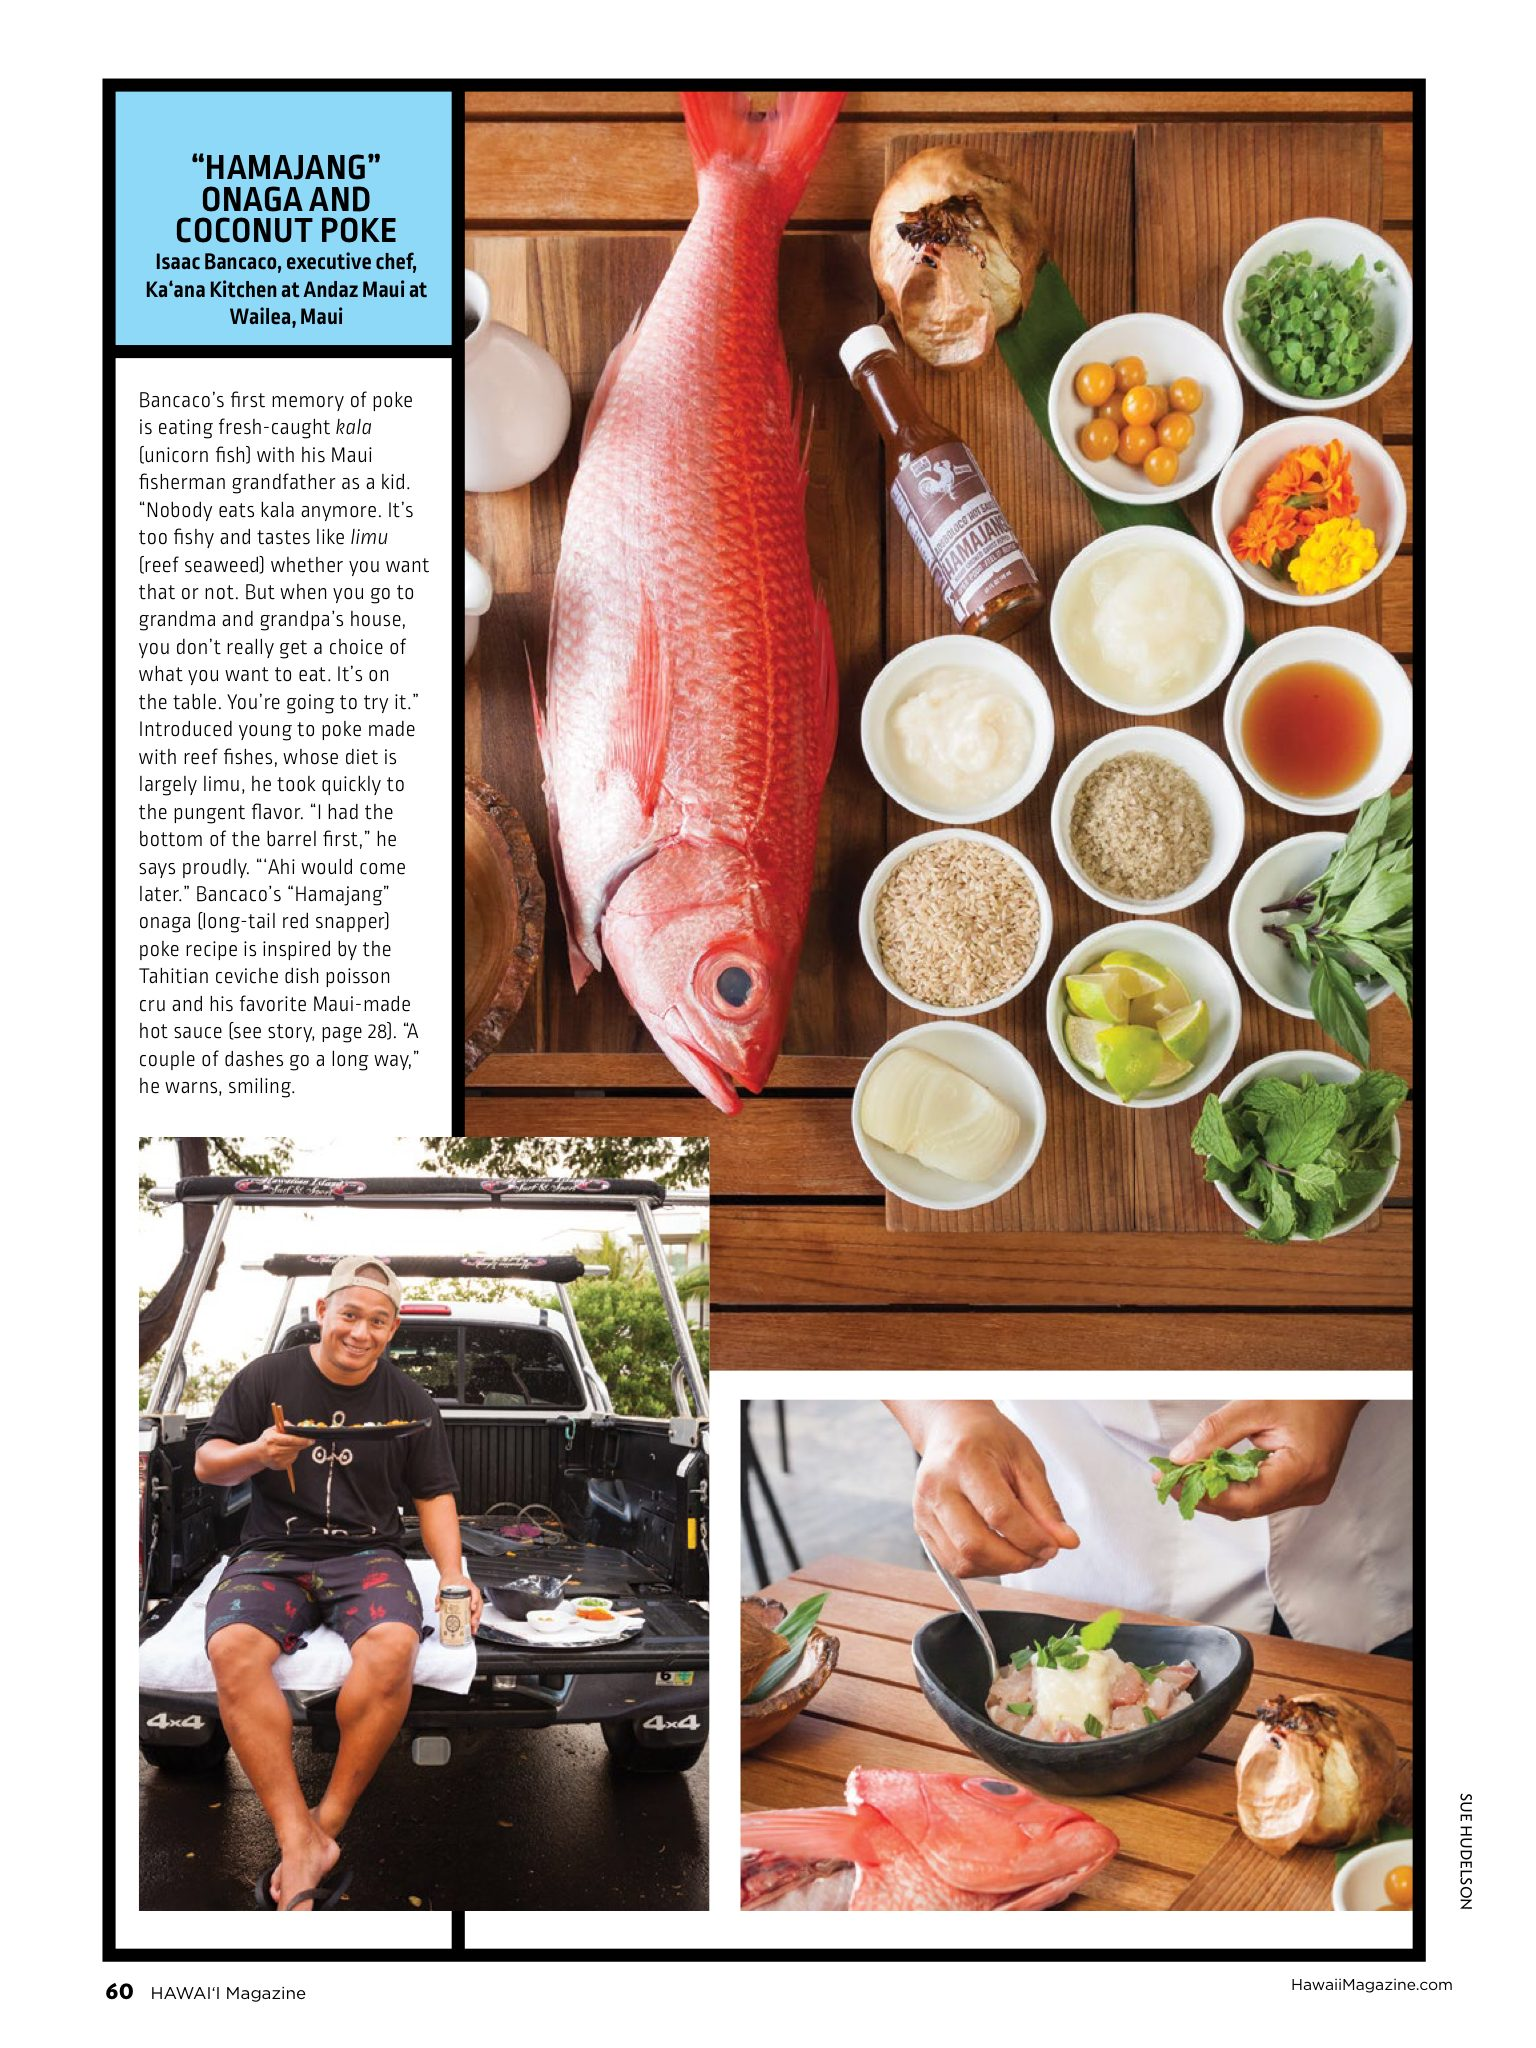 hawaii-magazine-december-2014-hamajang-poke-chef-isaac-bancaco-02